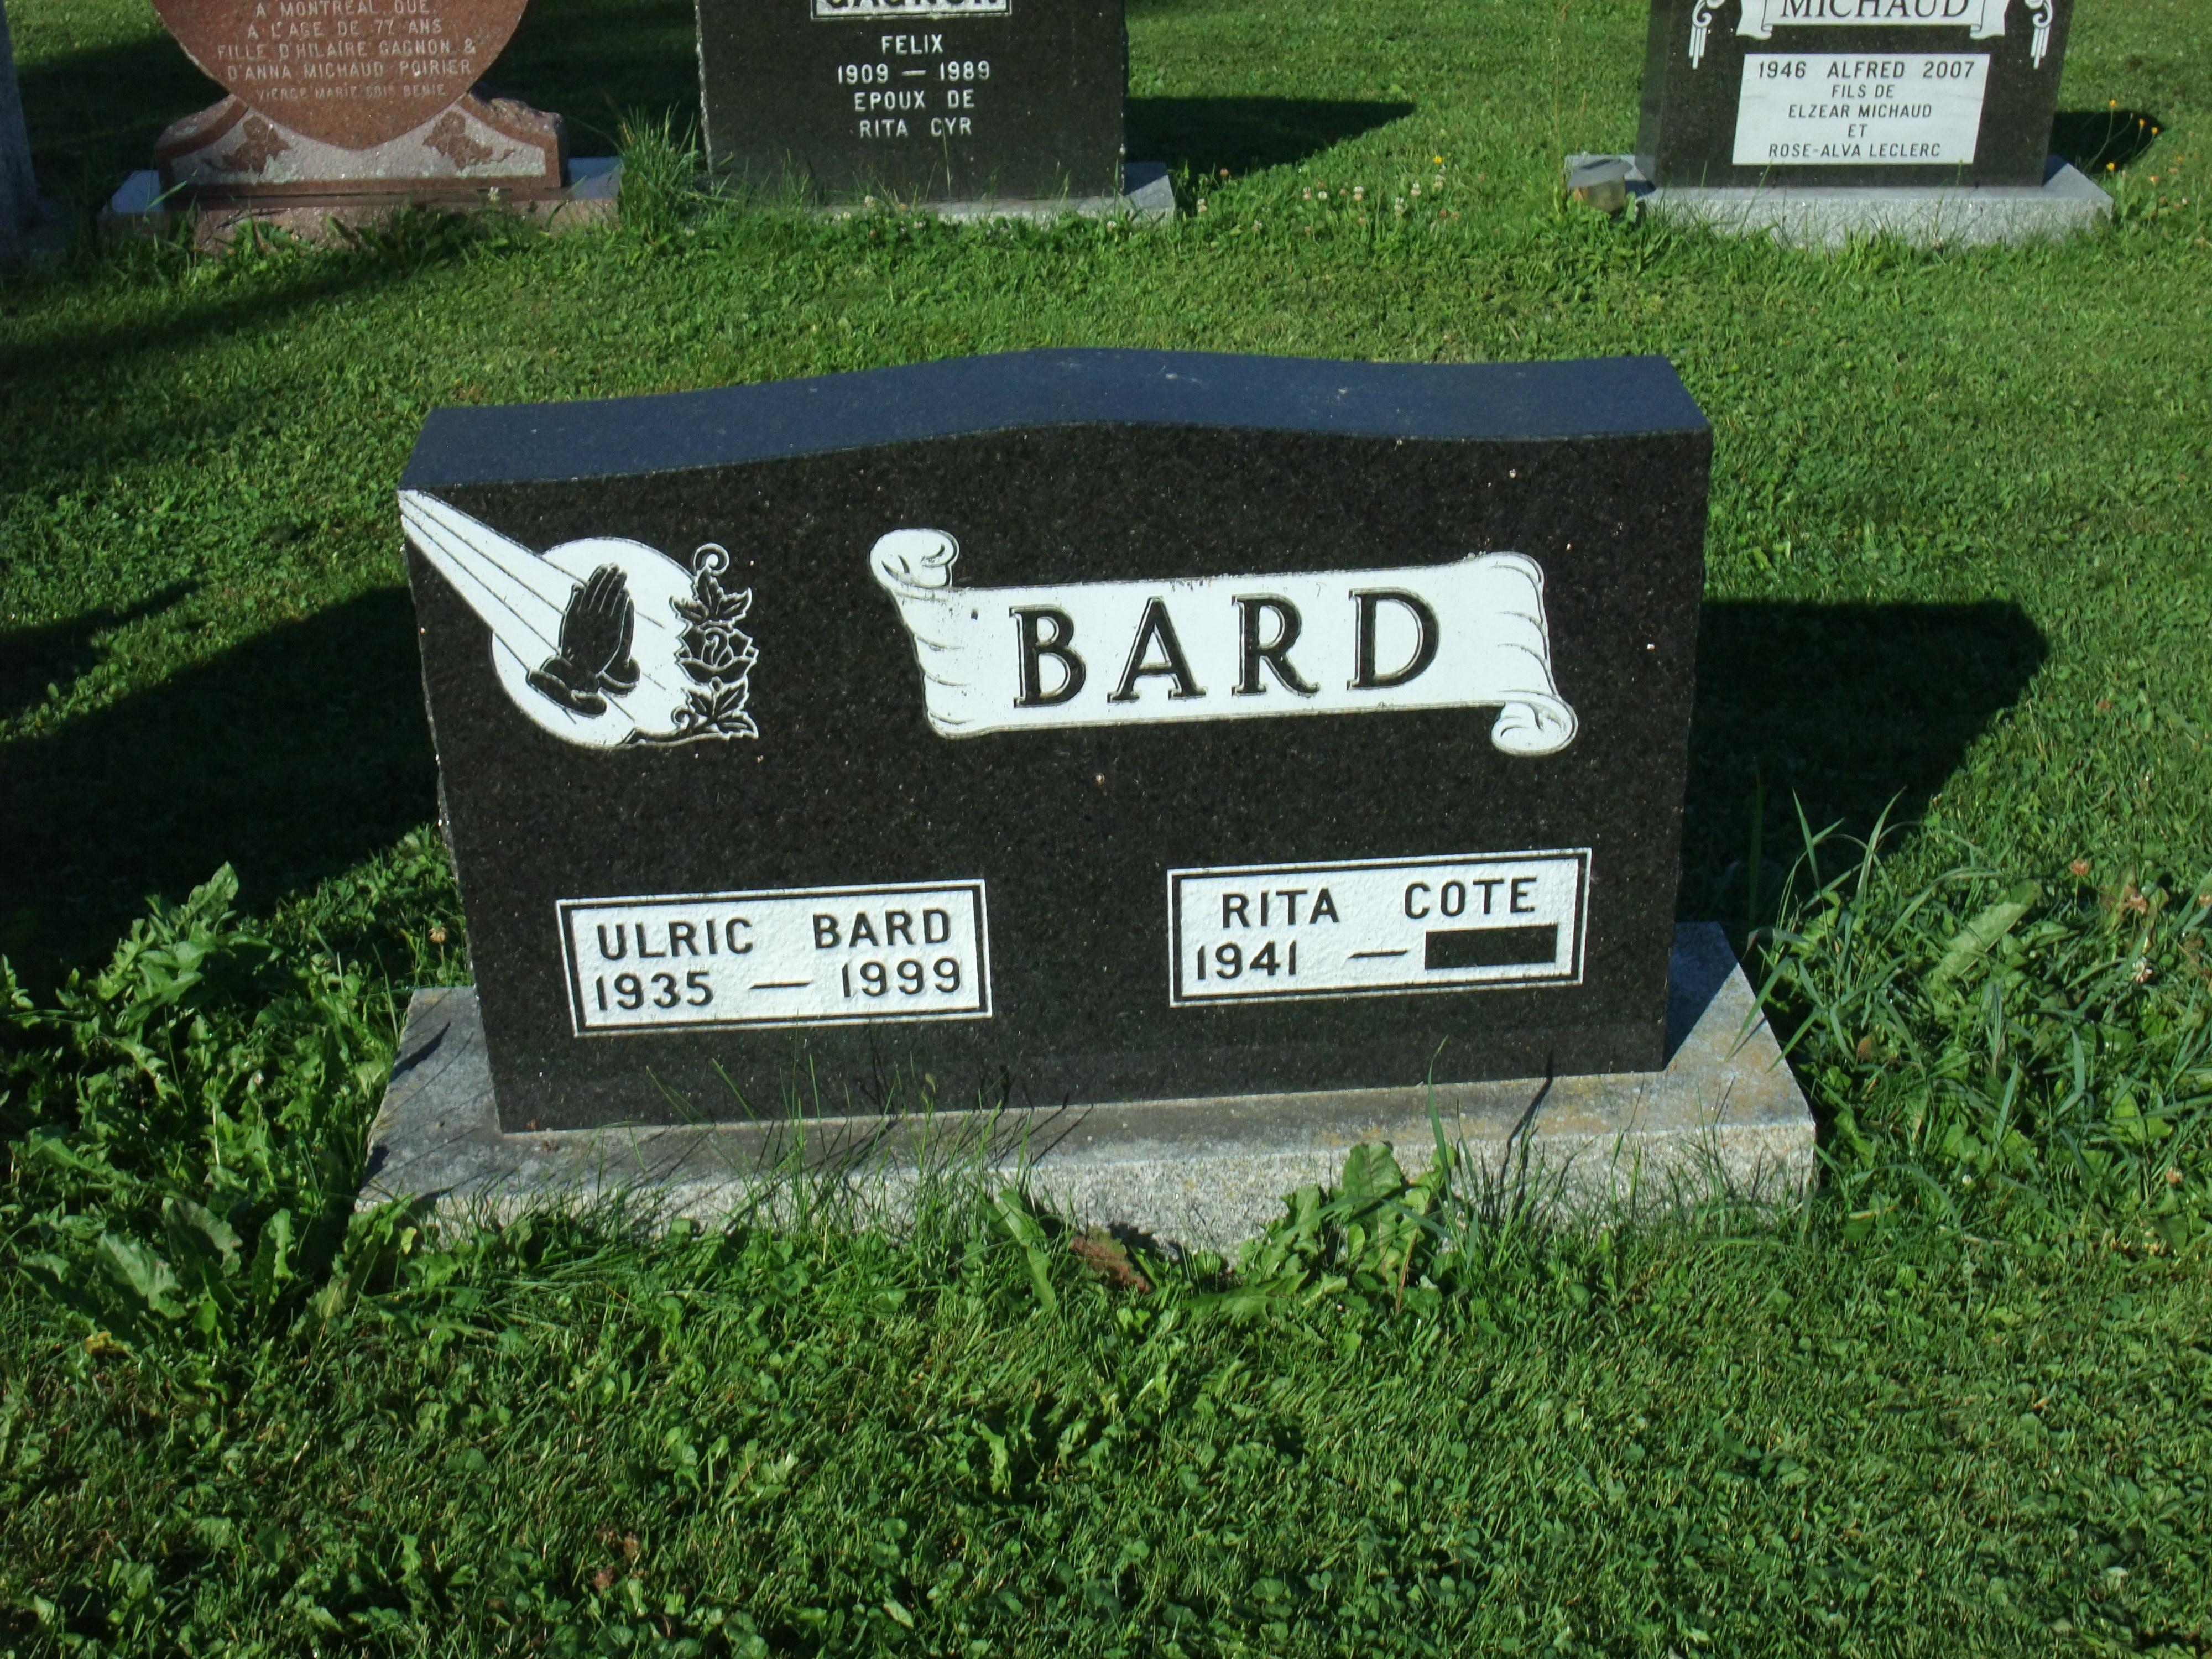 Ulric Bard